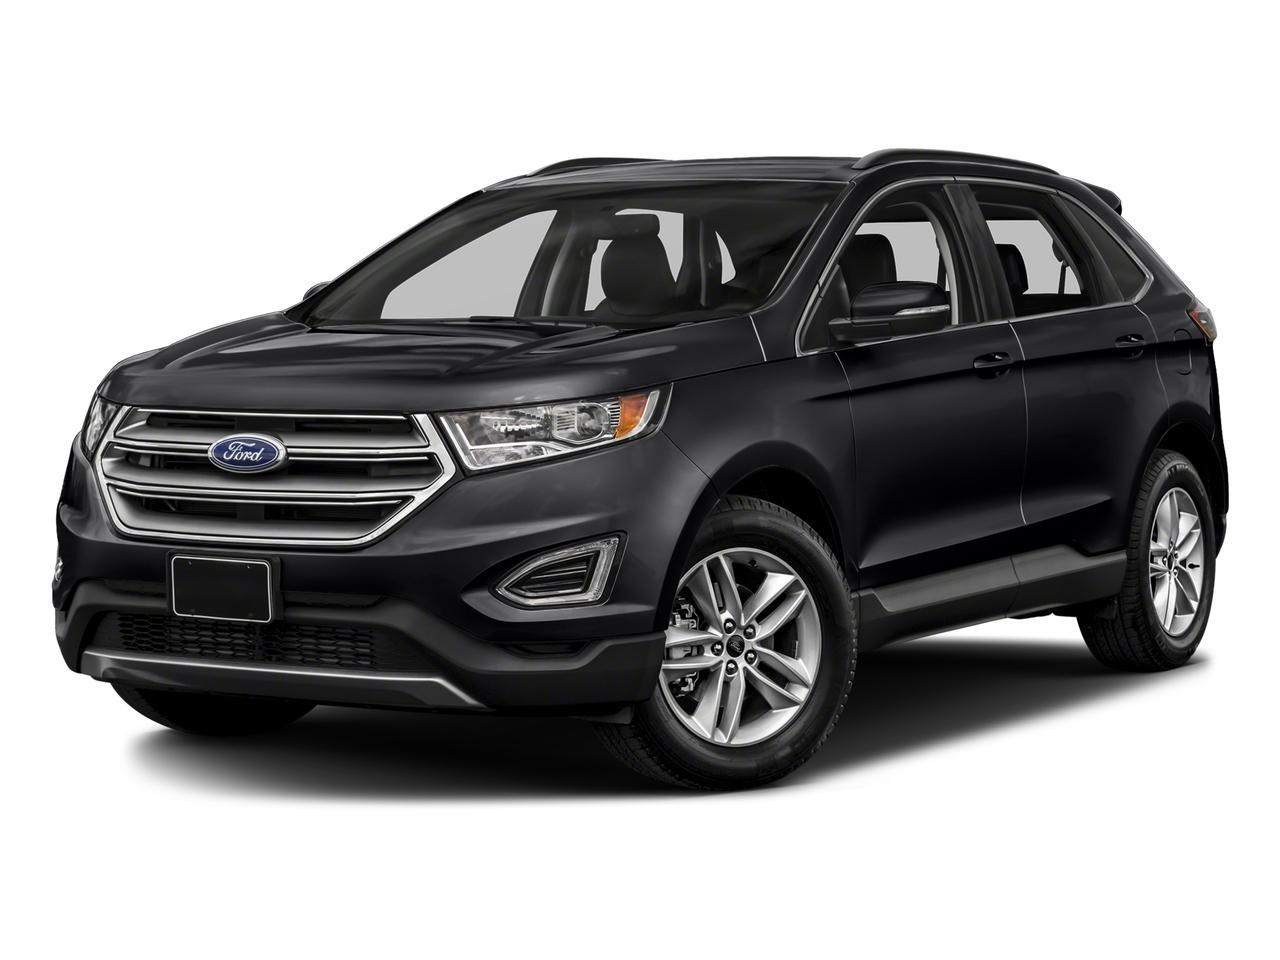 2018 Ford Edge Vehicle Photo in Oshkosh, WI 54904